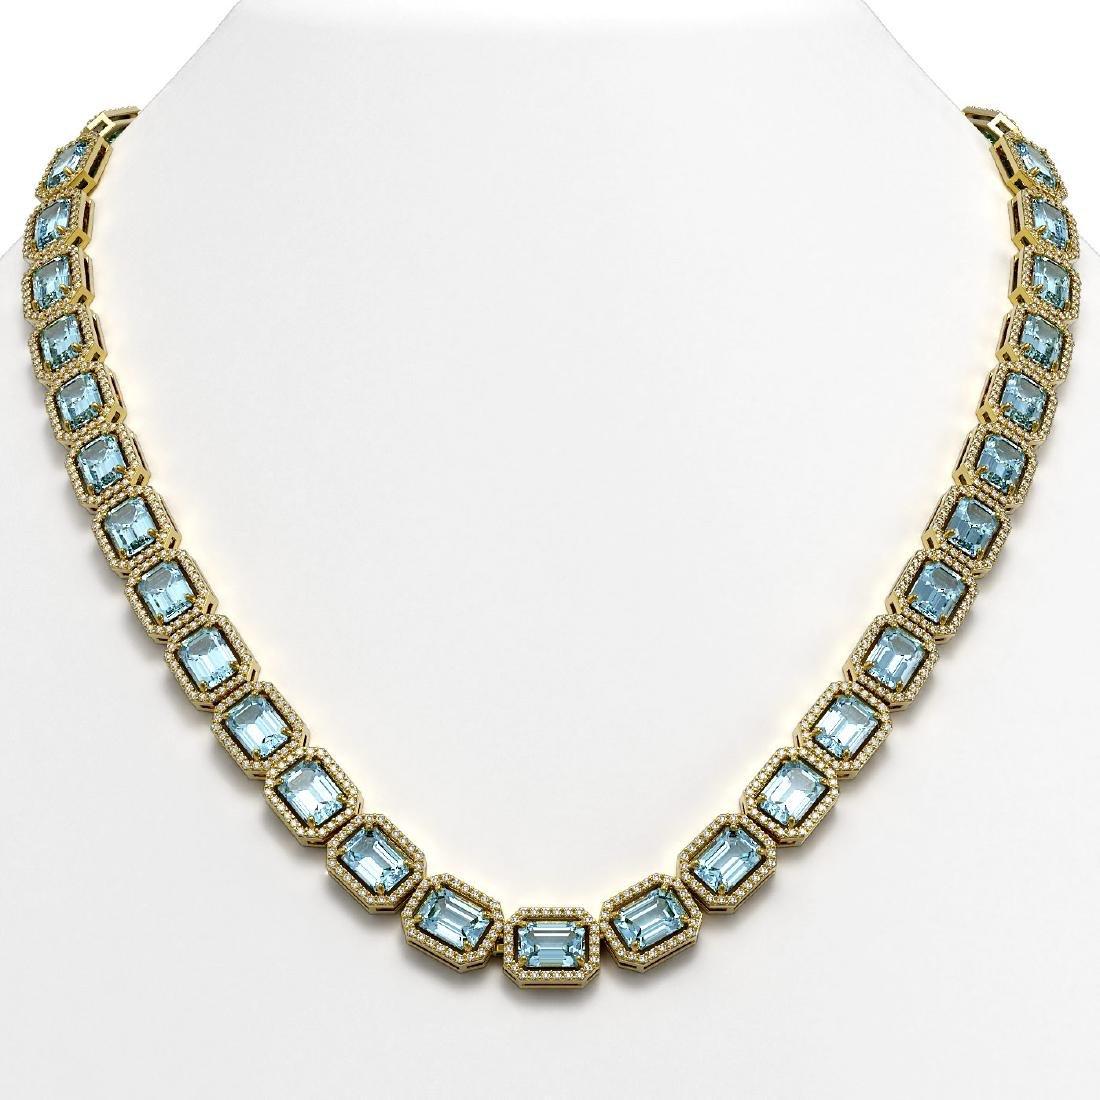 54.79 CTW Aquamarine & Diamond Halo Necklace 10K Yellow